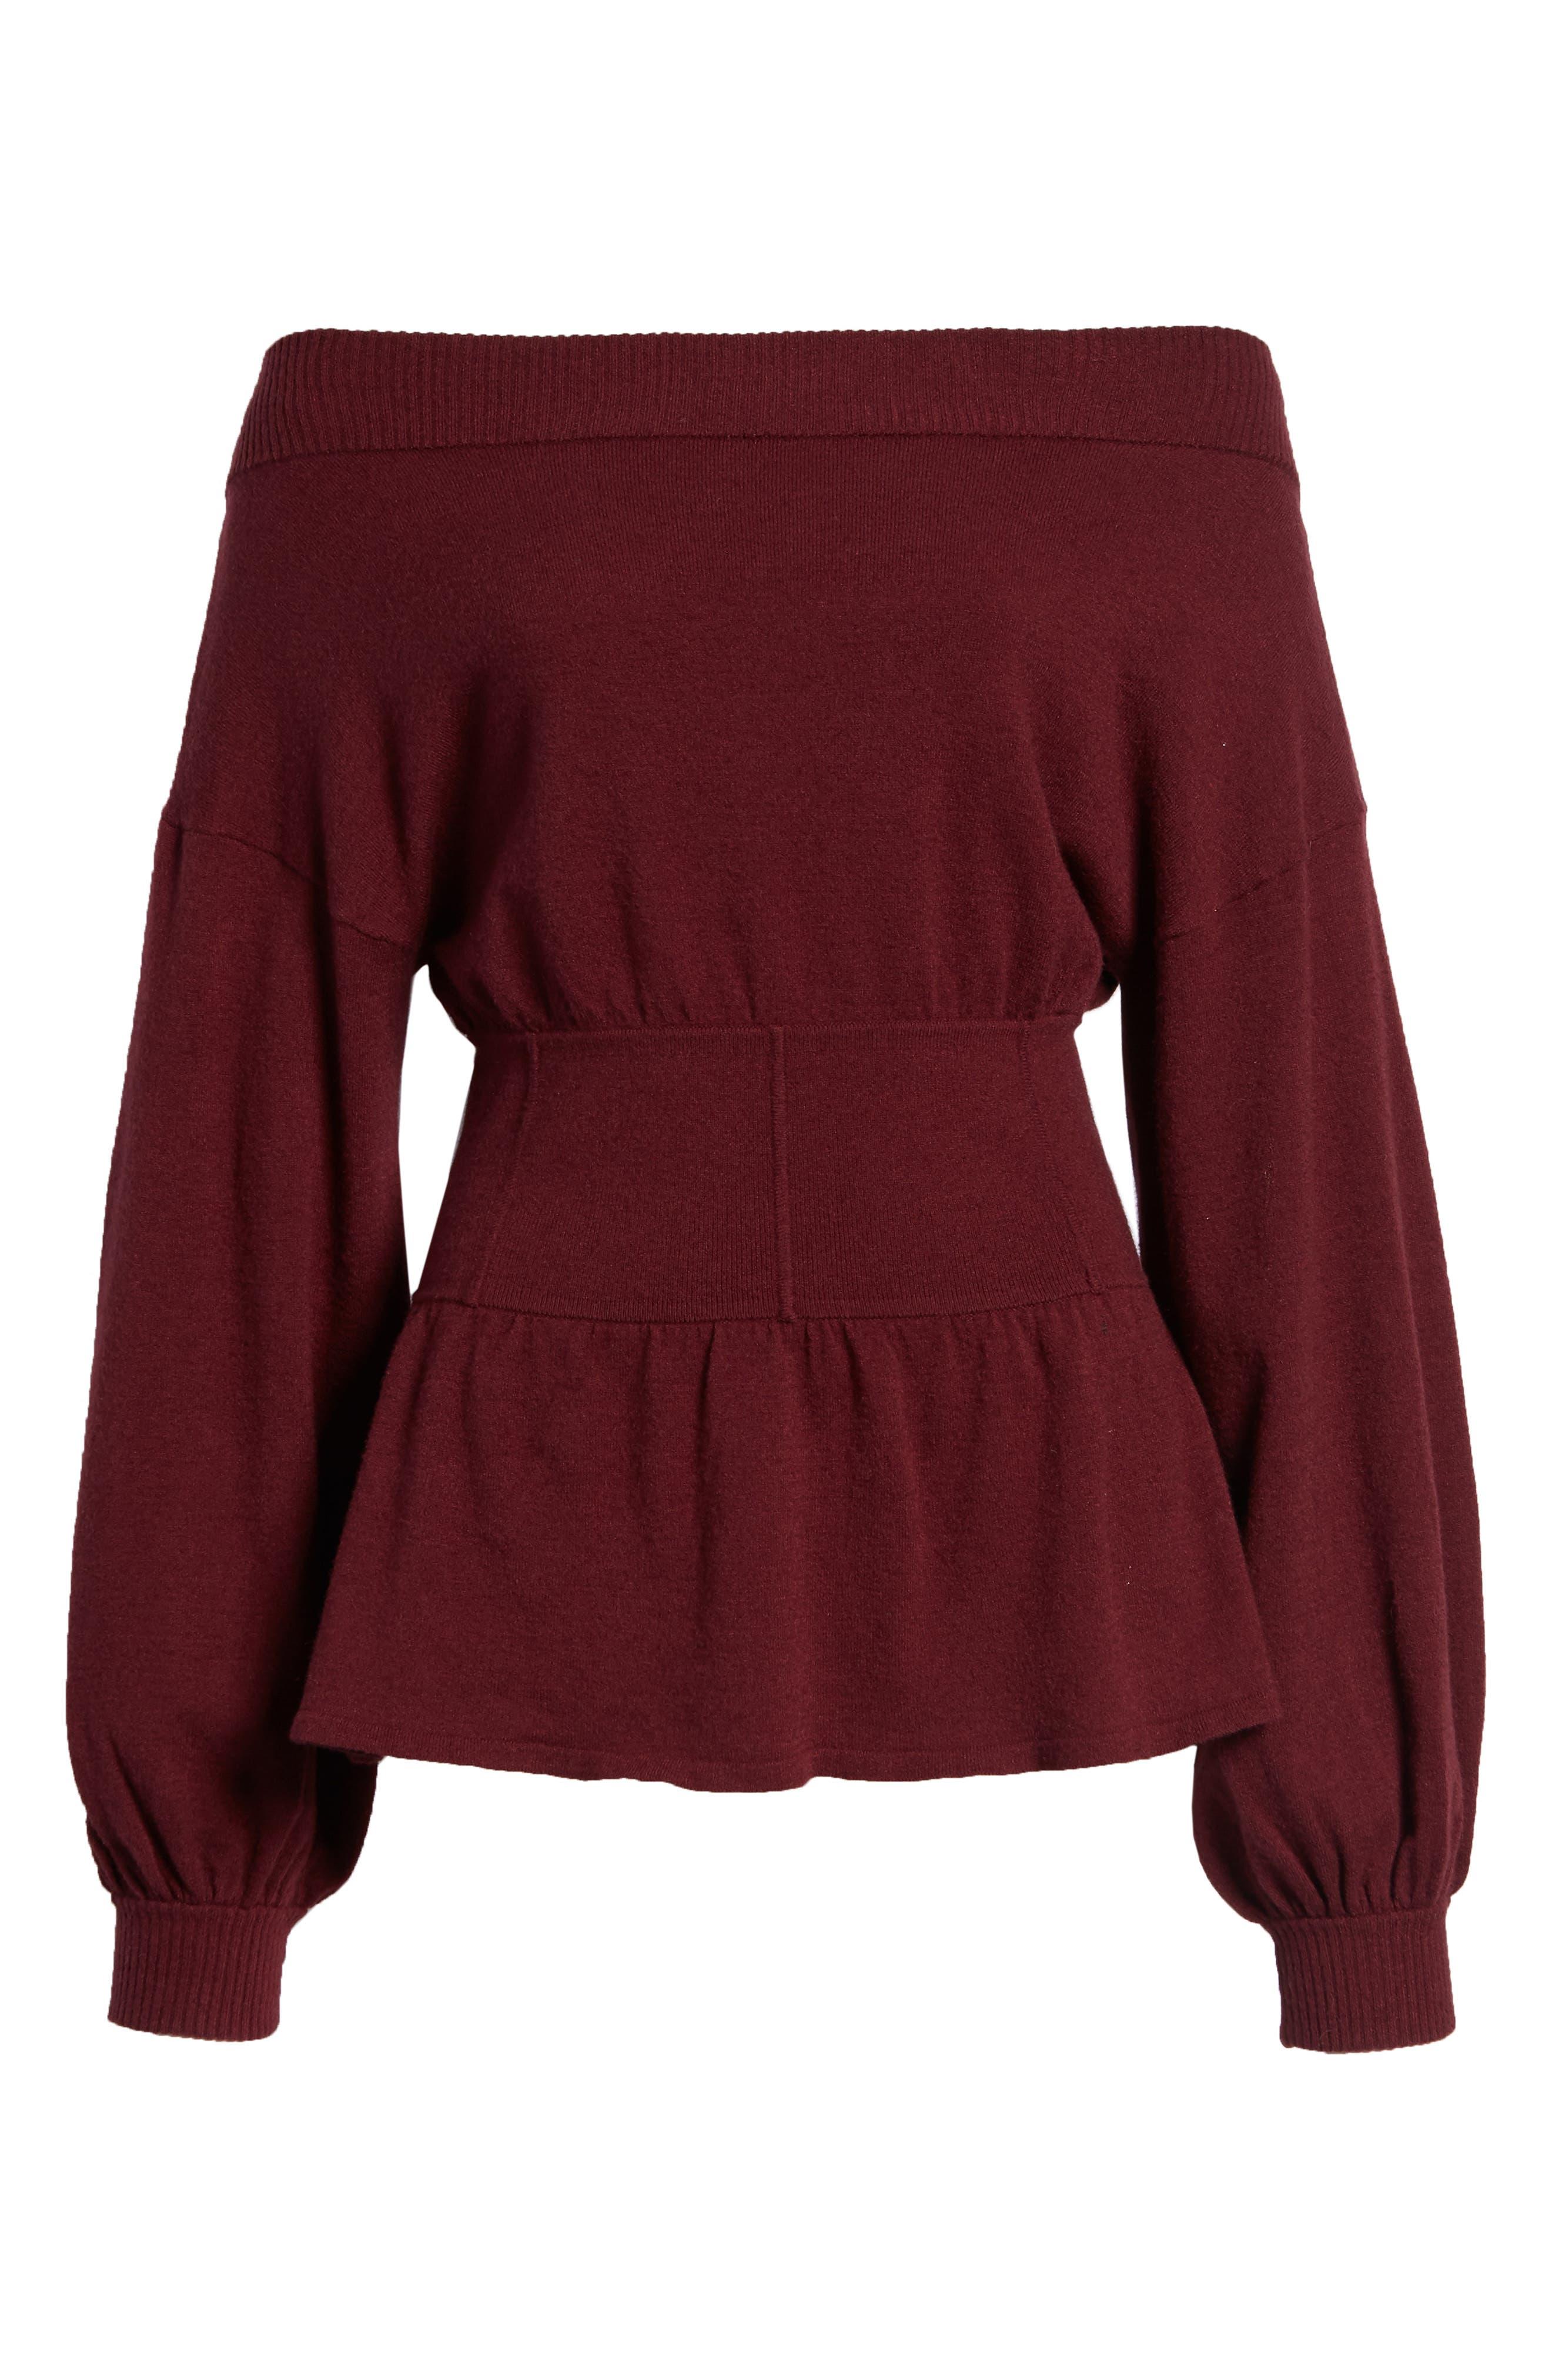 Waist Detail Off the Shoulder Sweater,                             Alternate thumbnail 6, color,                             601